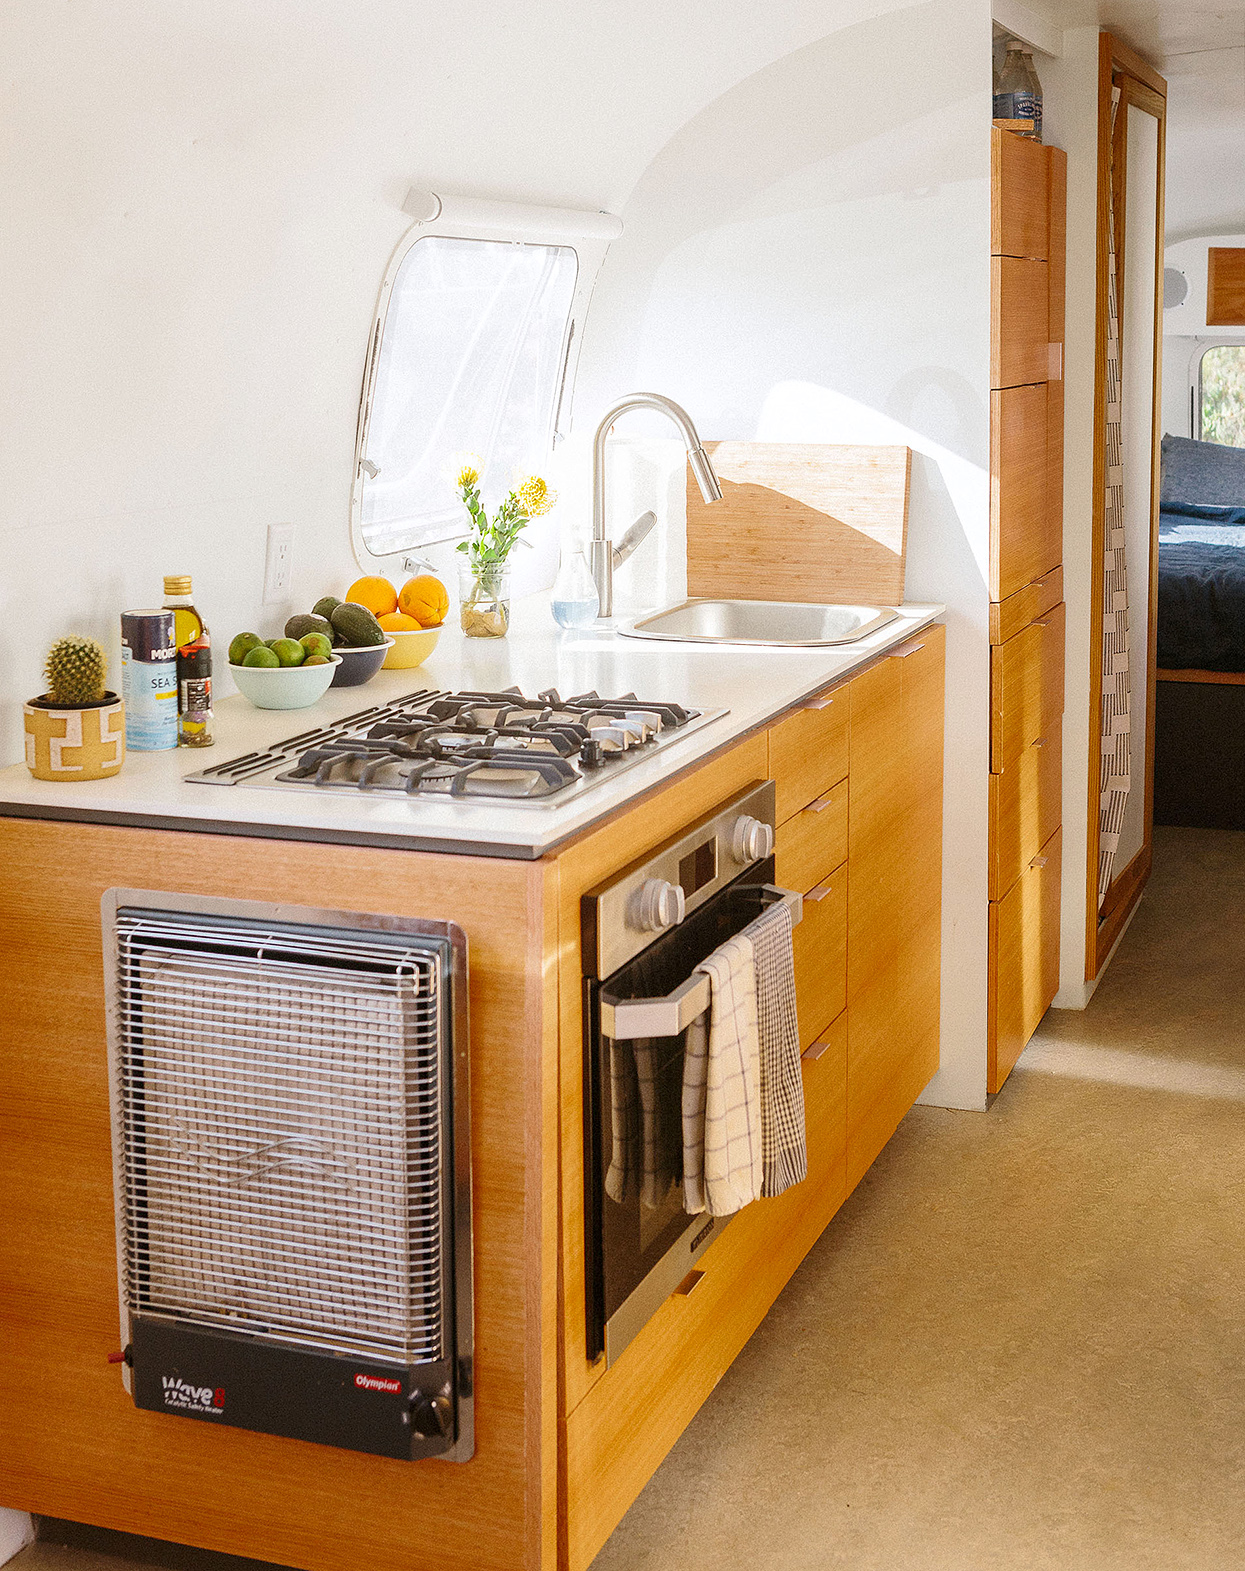 red oak wood kitchen in airstream trailer